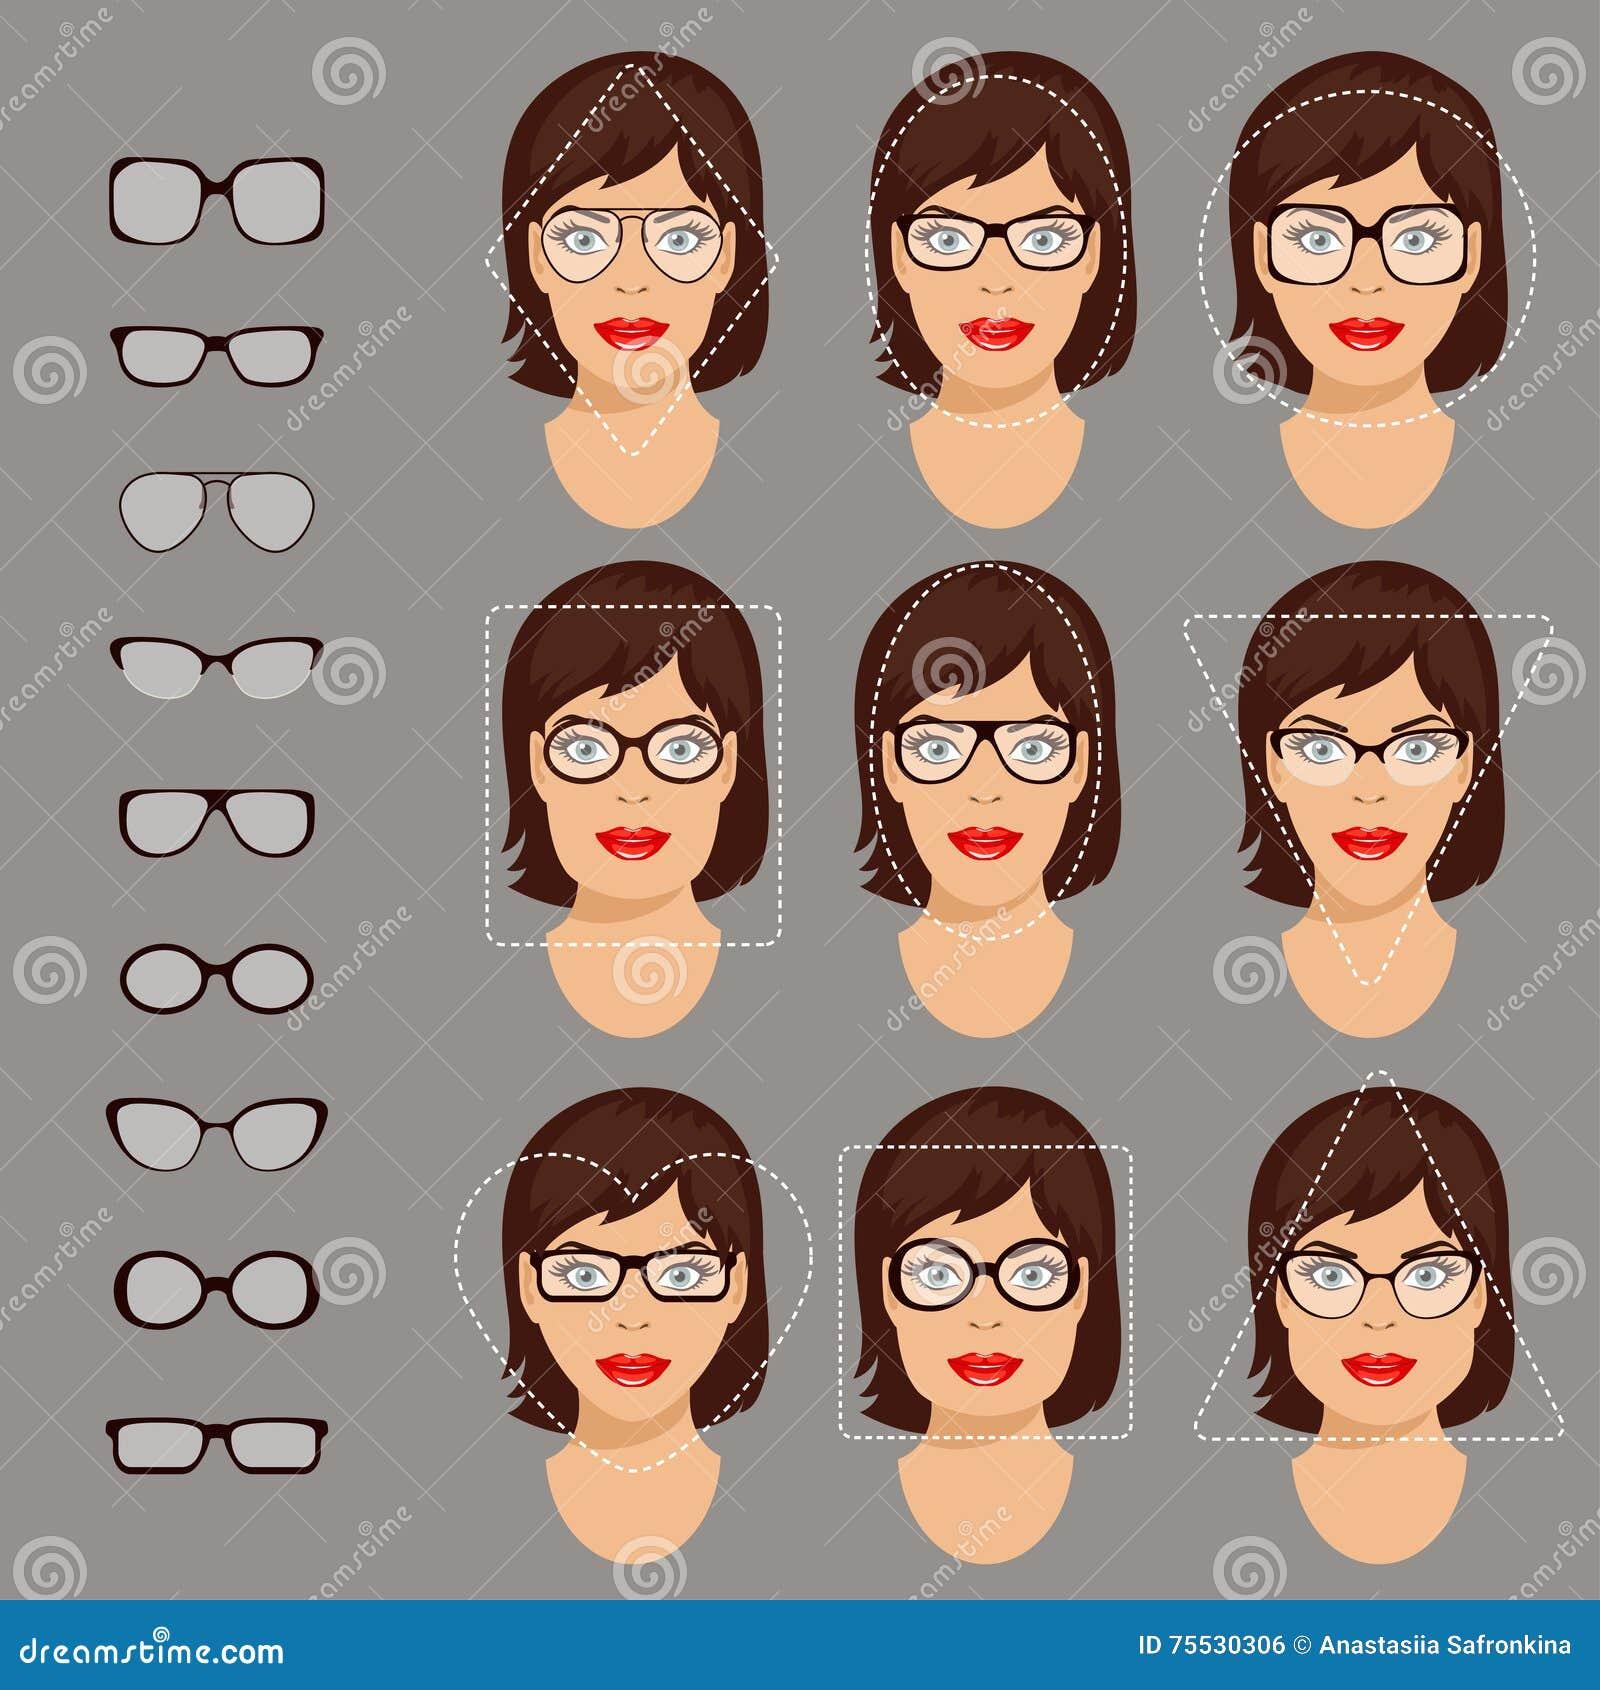 3fa3cfa1bfc Glasses shapes 1. stock vector. Illustration of circle - 75530306